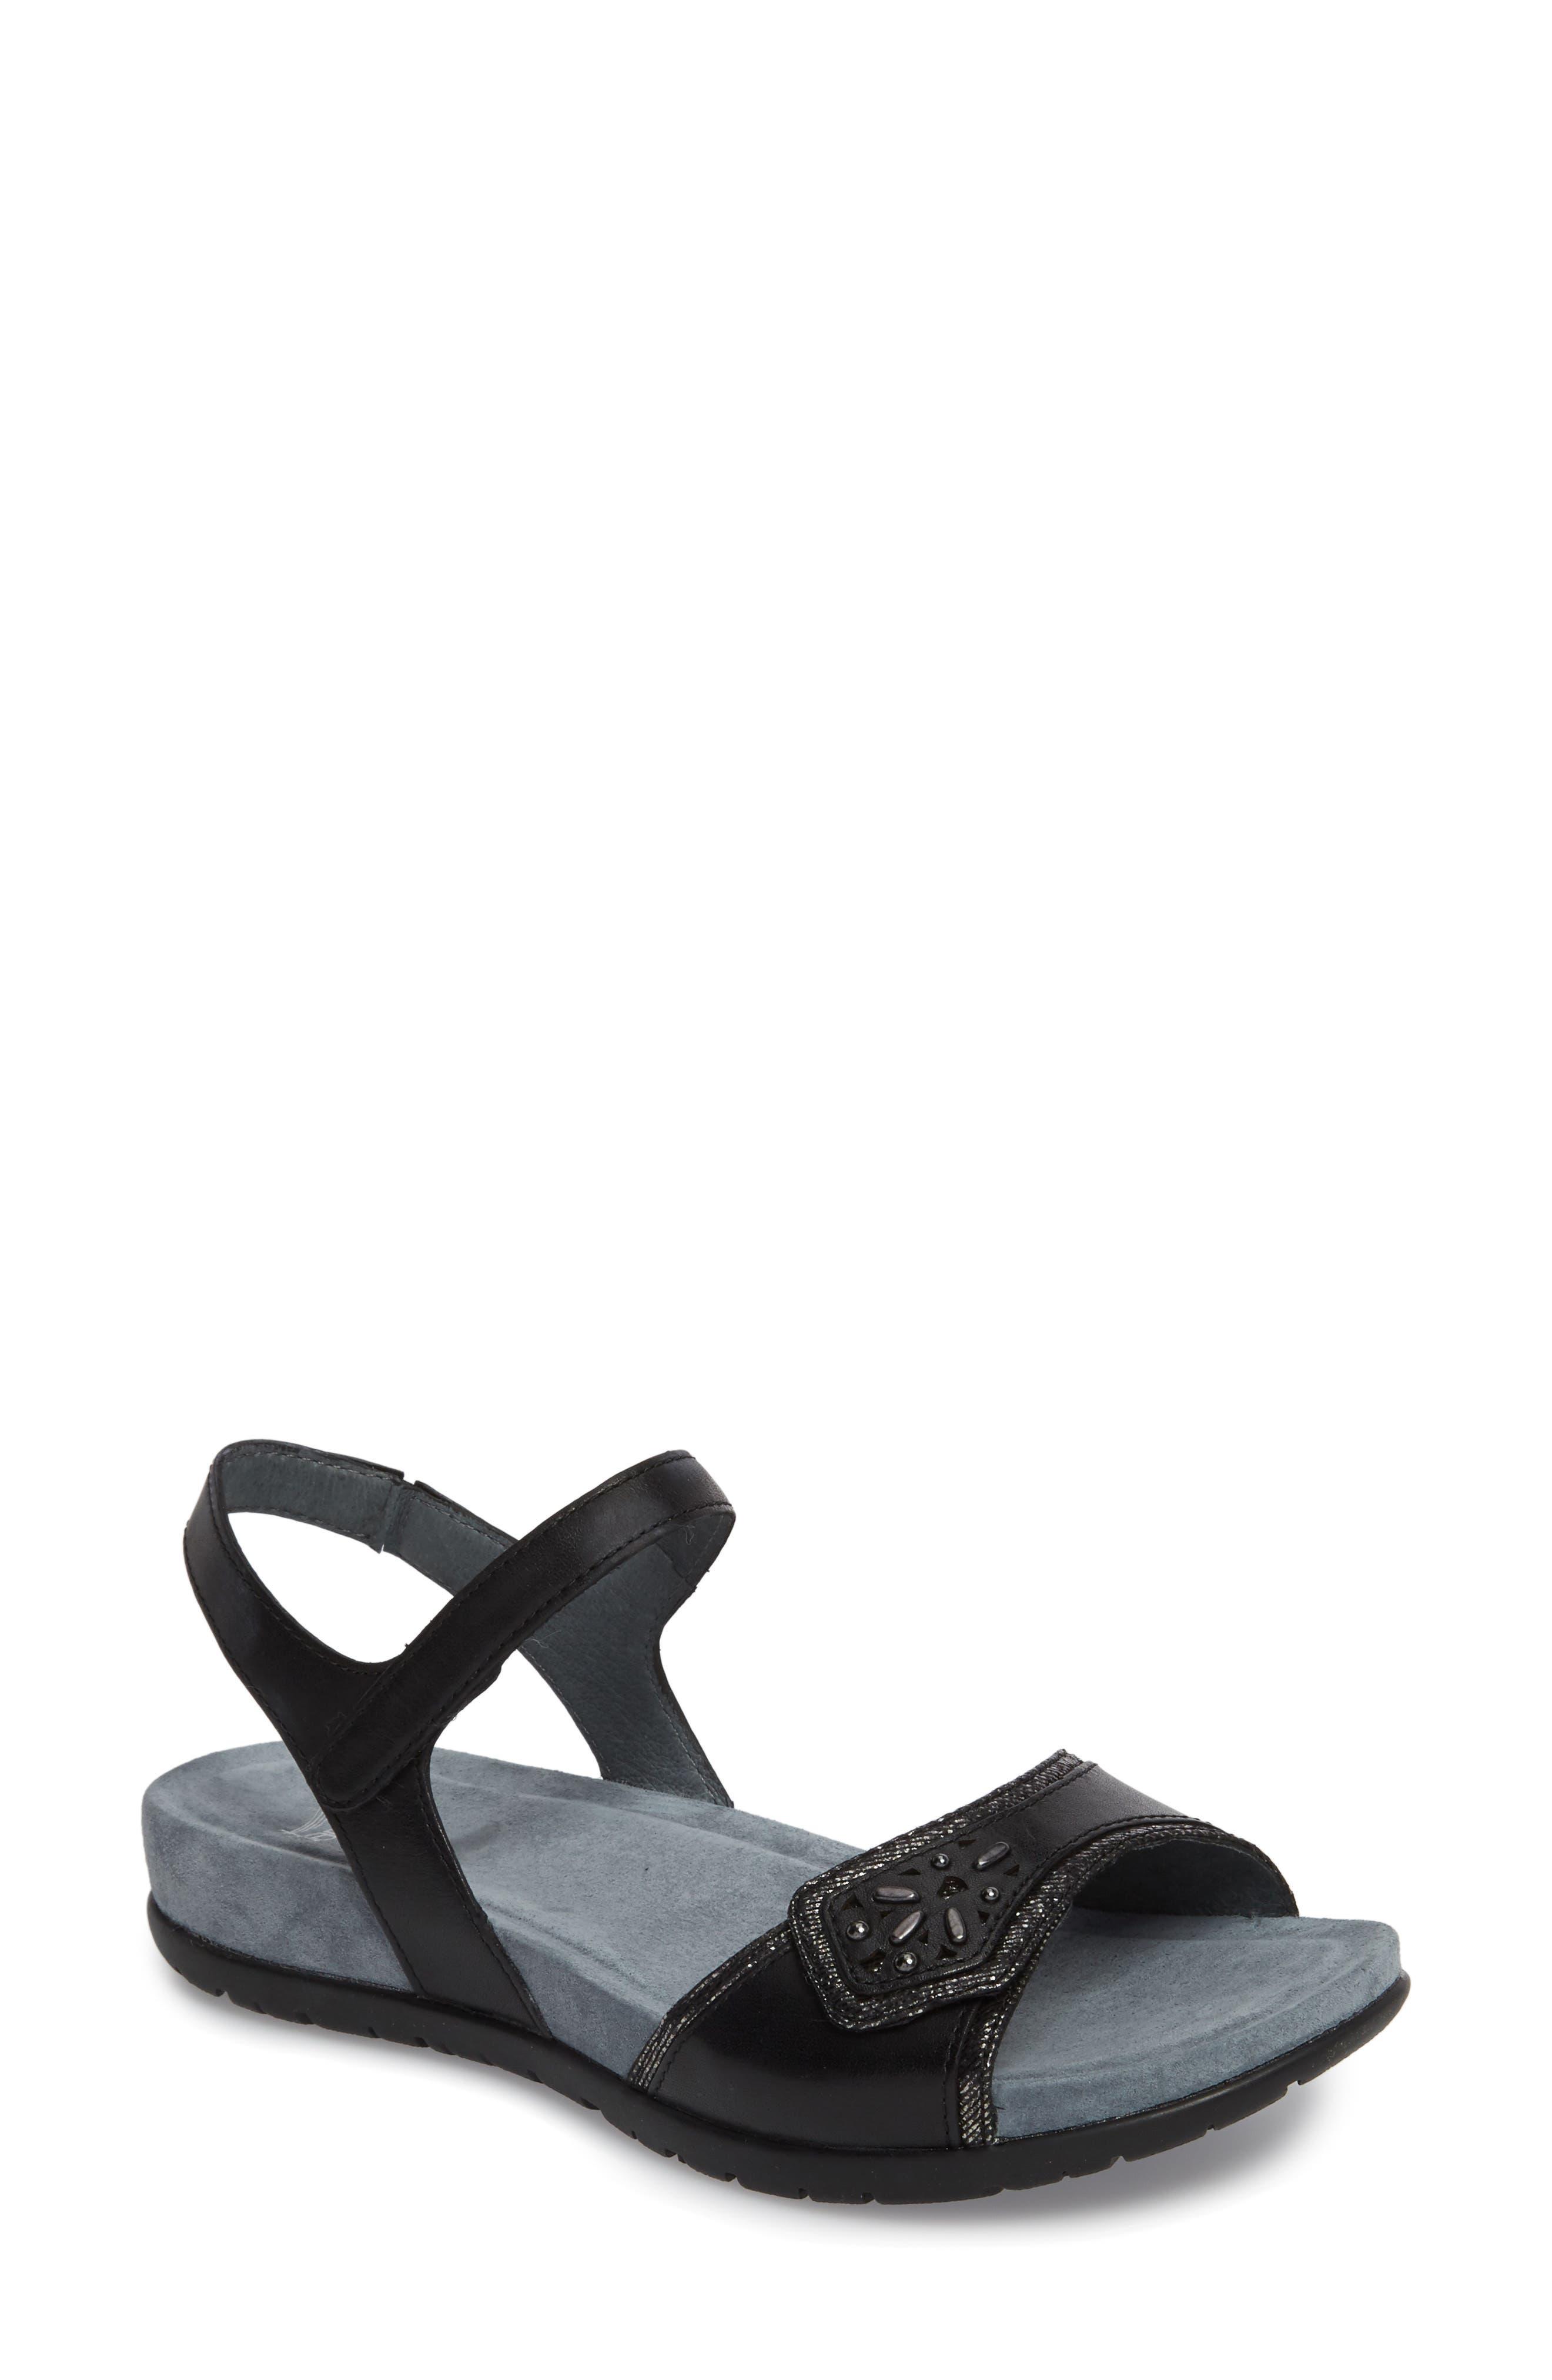 Blythe Sandal,                         Main,                         color, 001